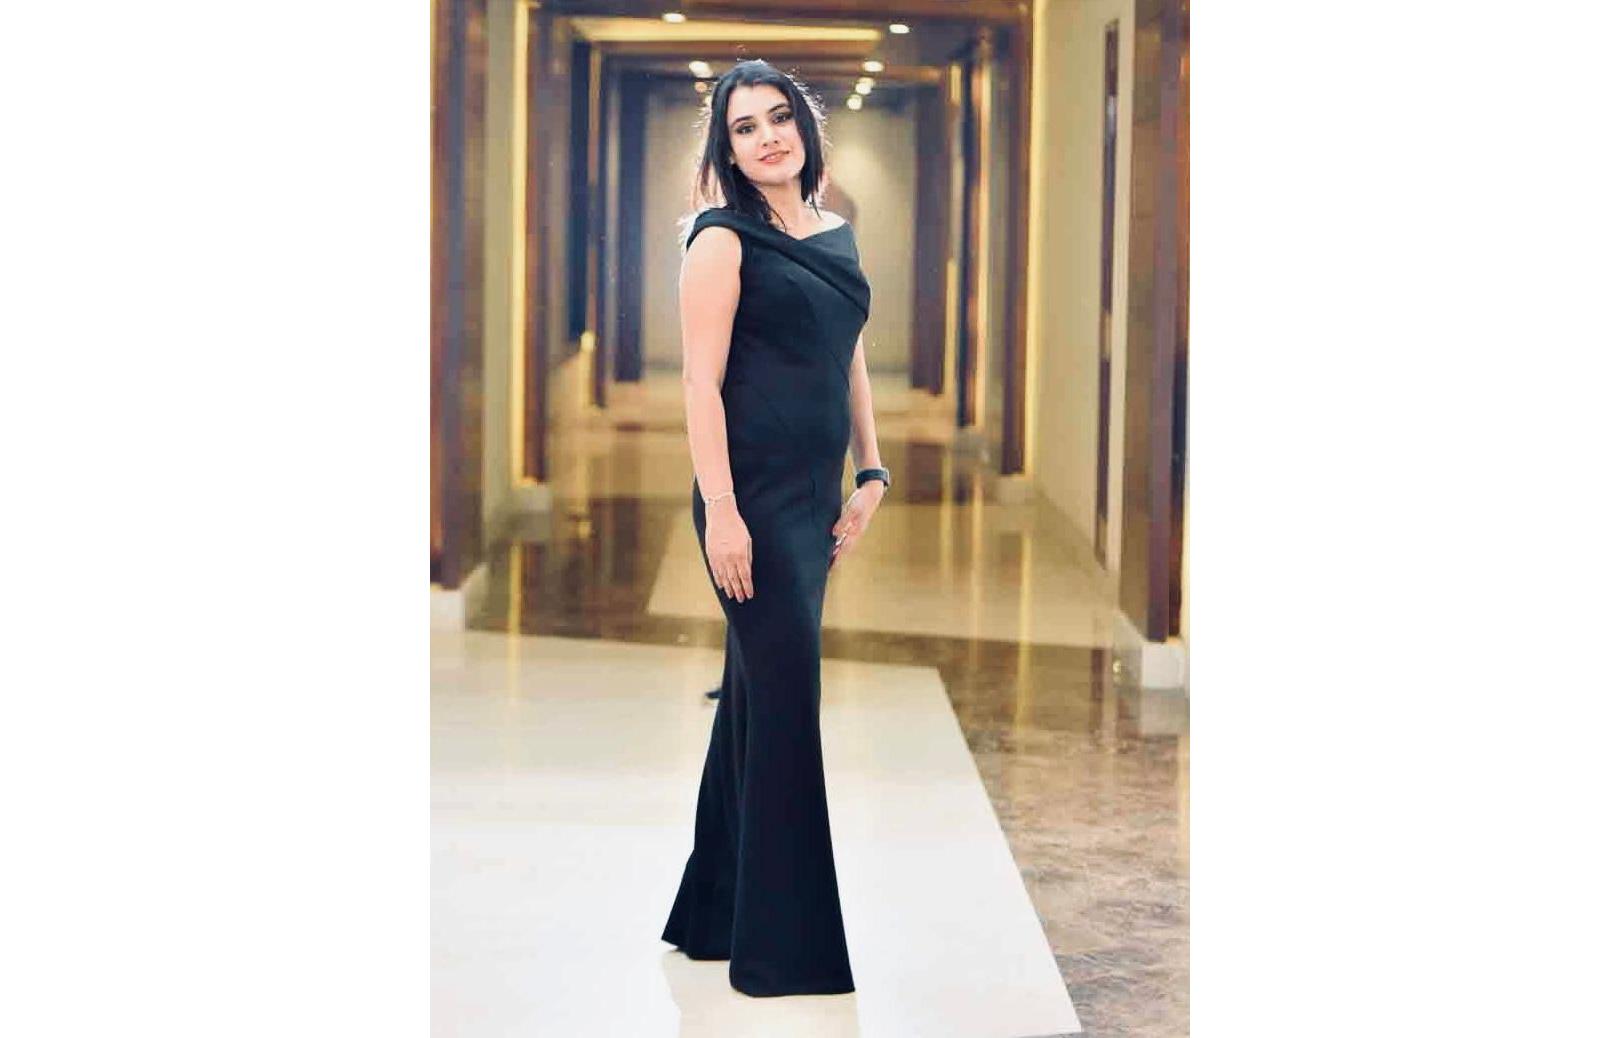 Influencerquipo presents Best female community builder of the year 2021- Bindu Garg